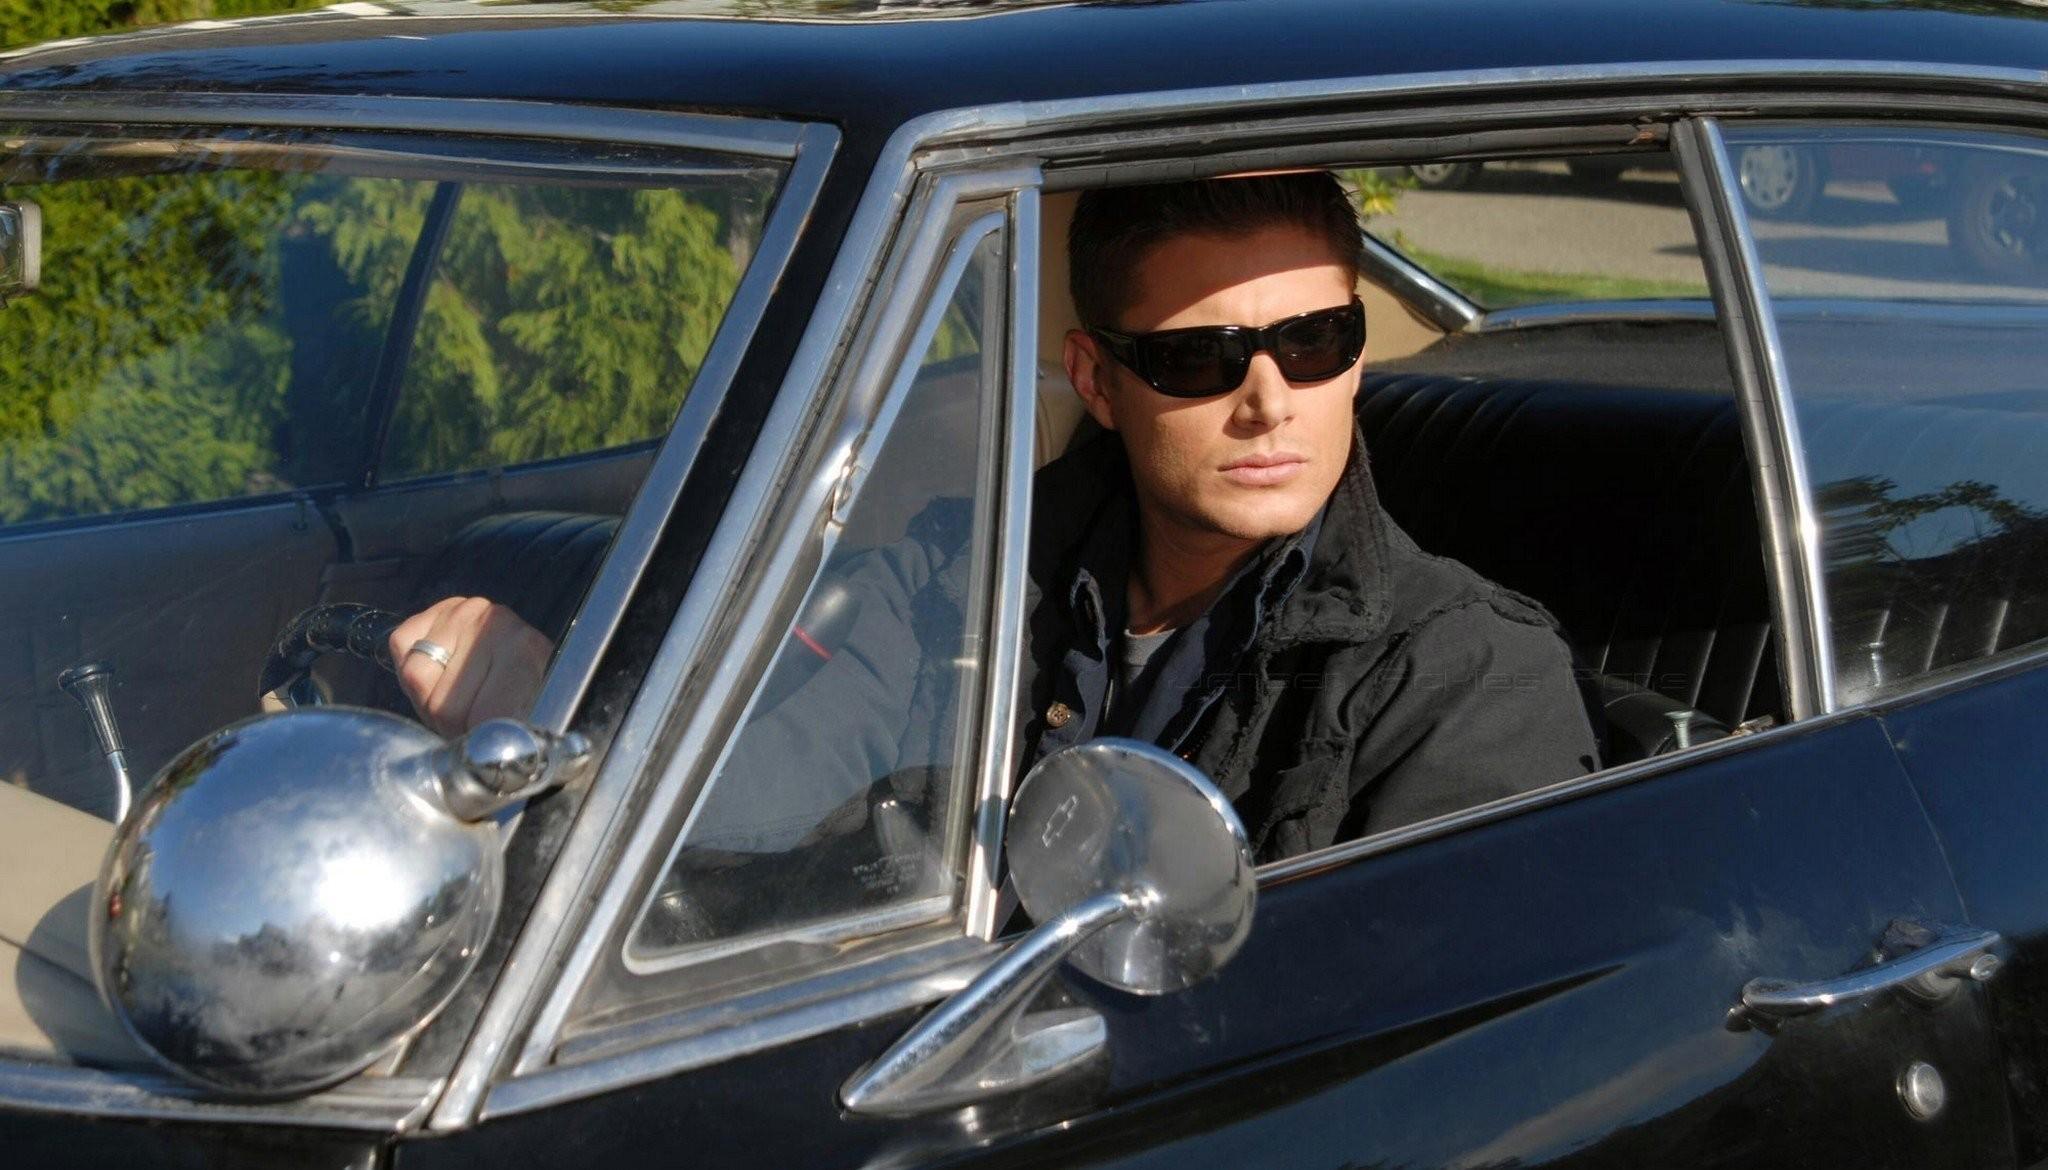 supernatural dean winchester jensen ackles impala sunglasses smile